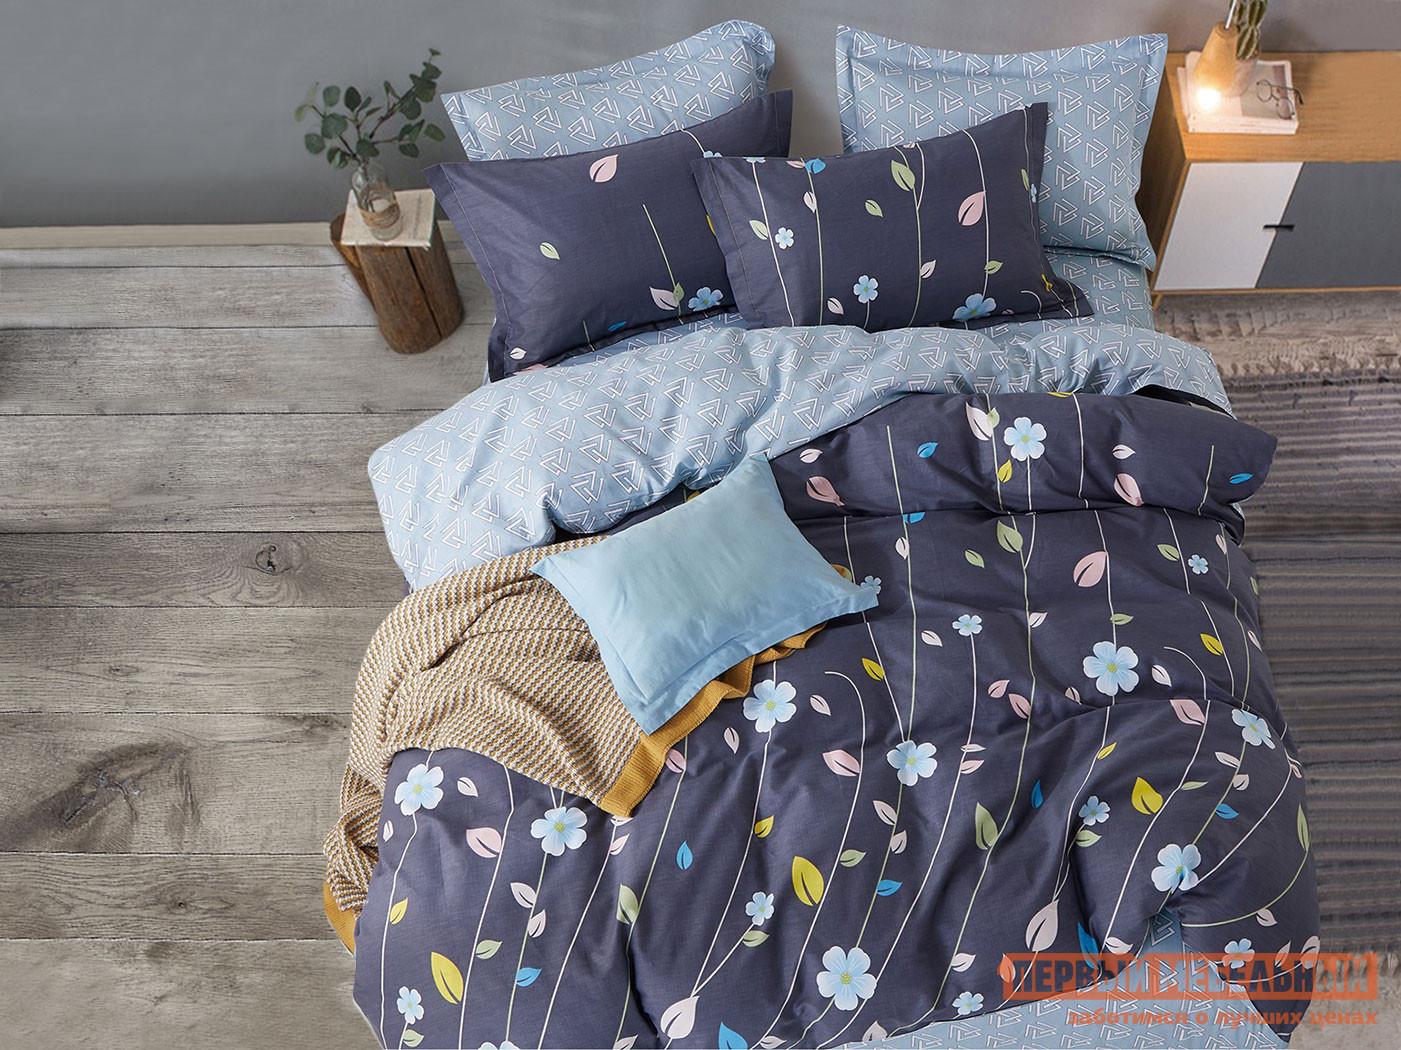 Комплект постельного белья КПБ Butterfly Сатин 157 157, сатин, Евро фото